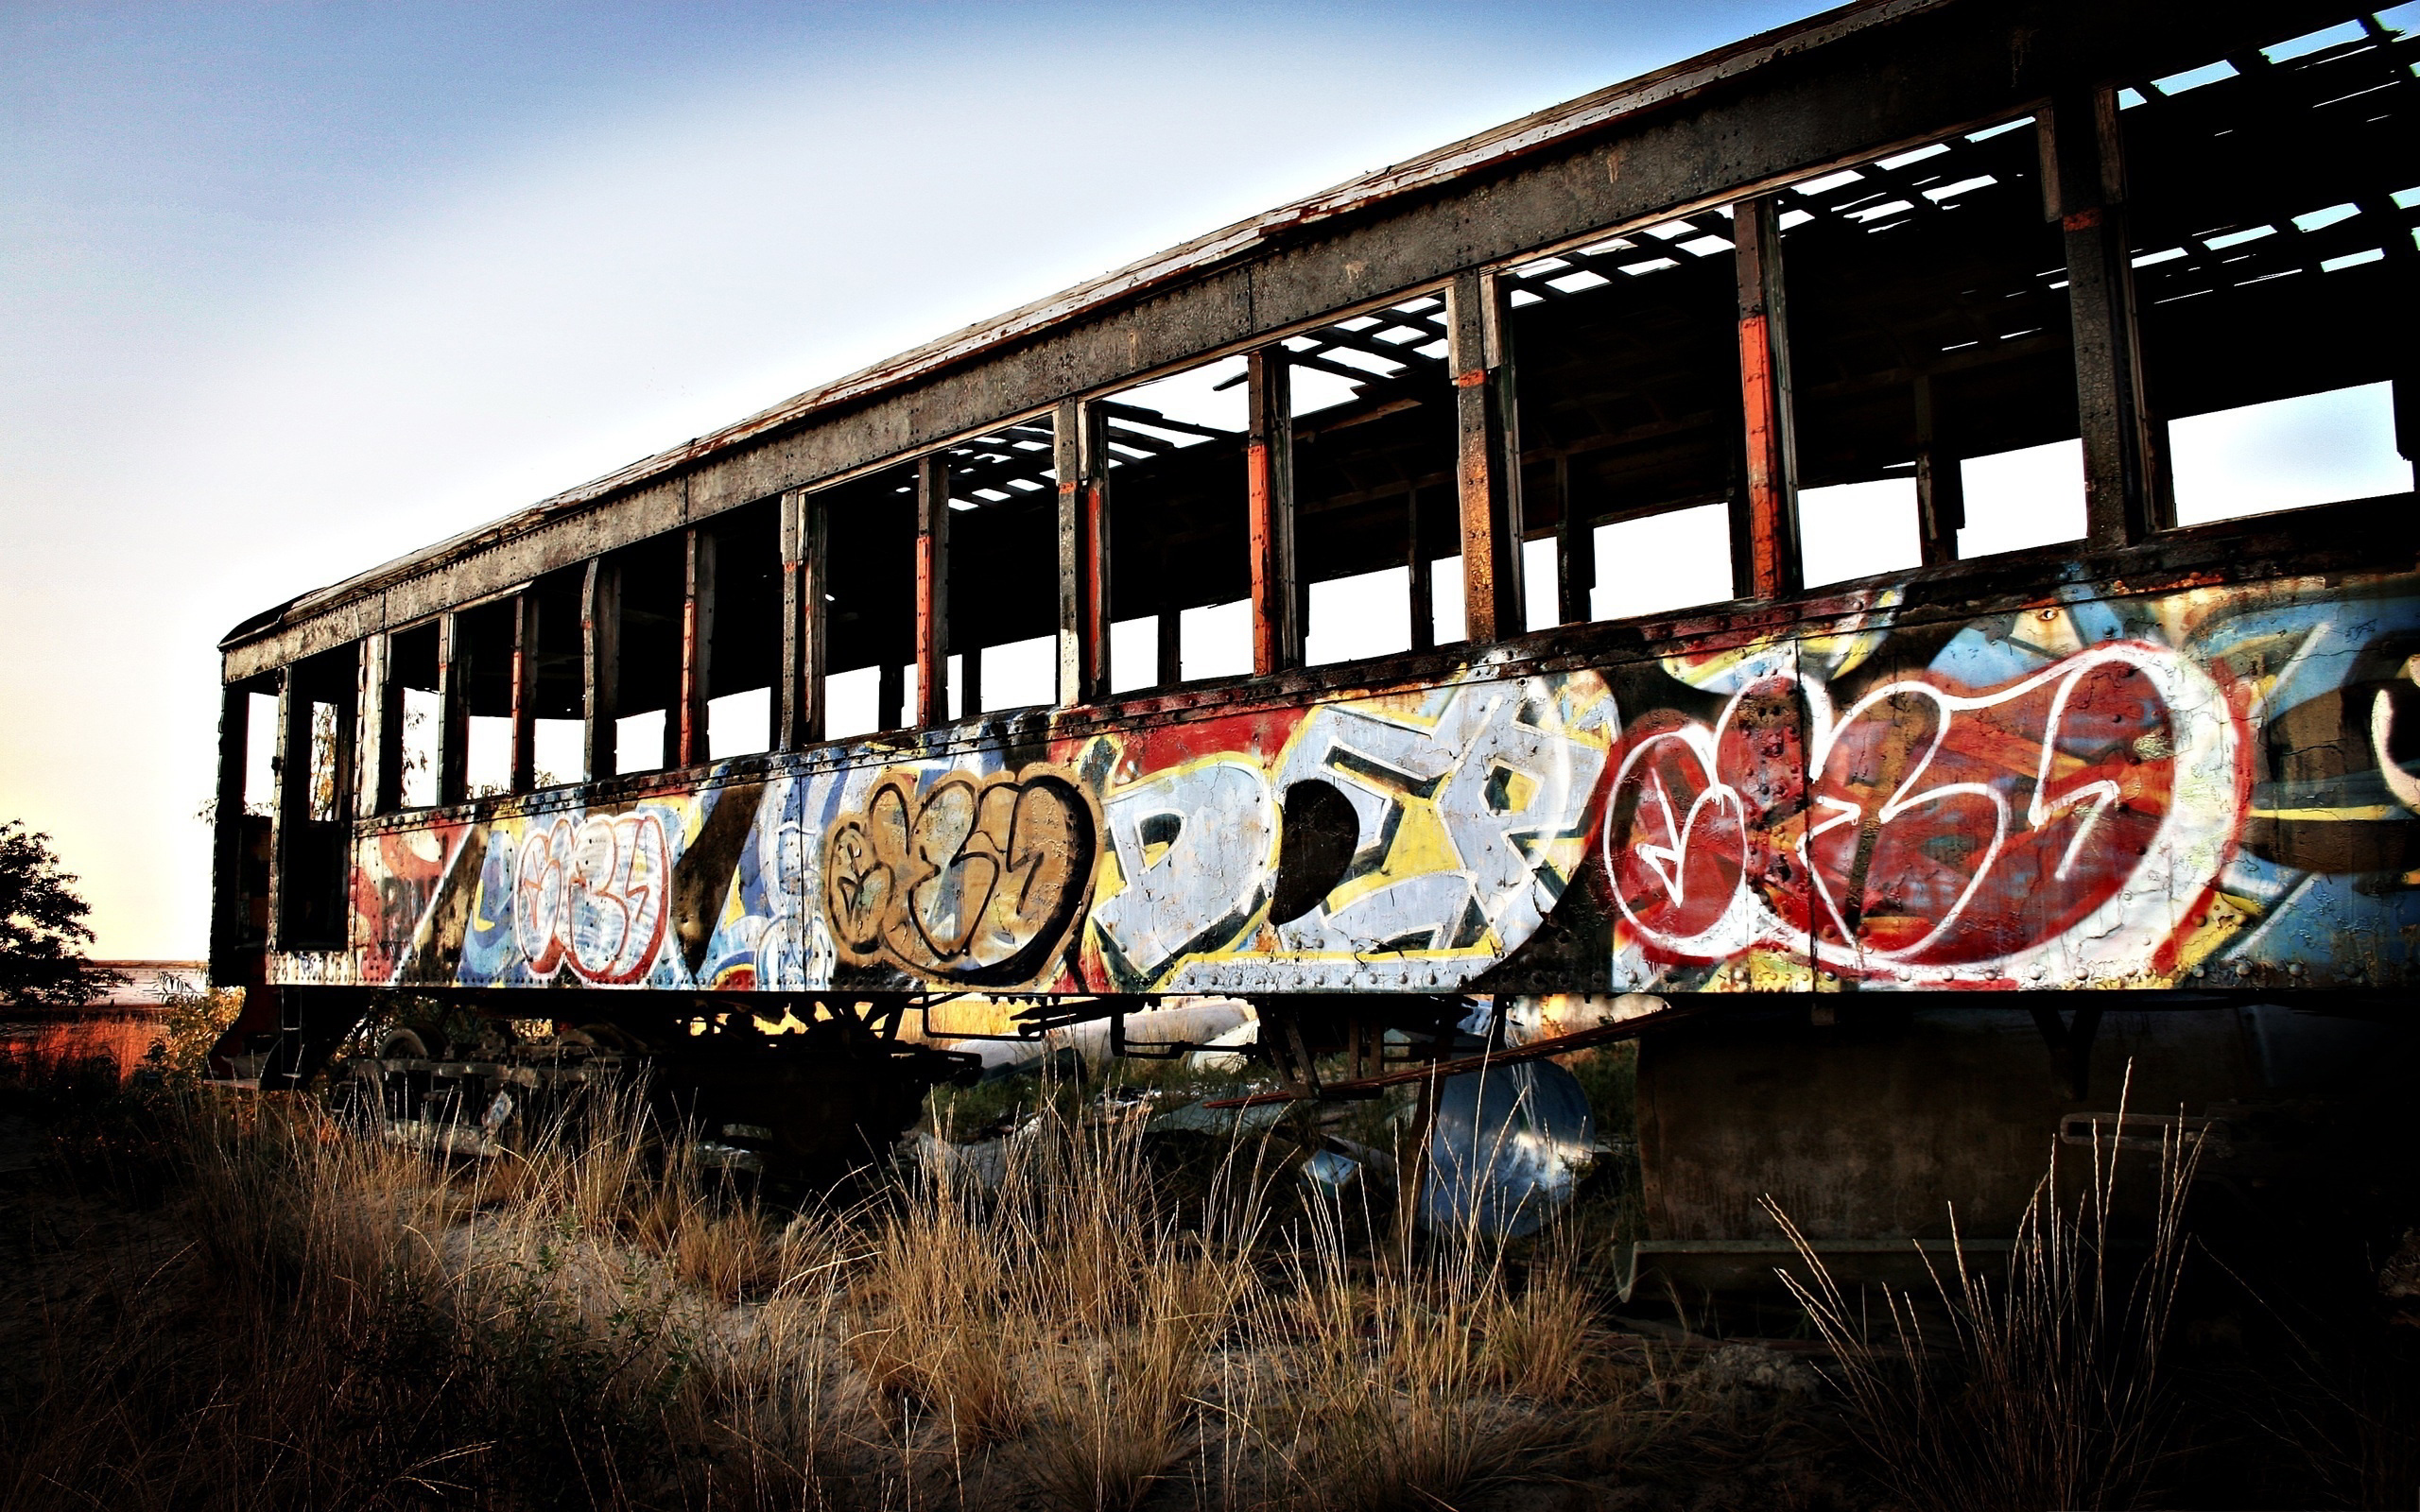 Train wagon graffiti